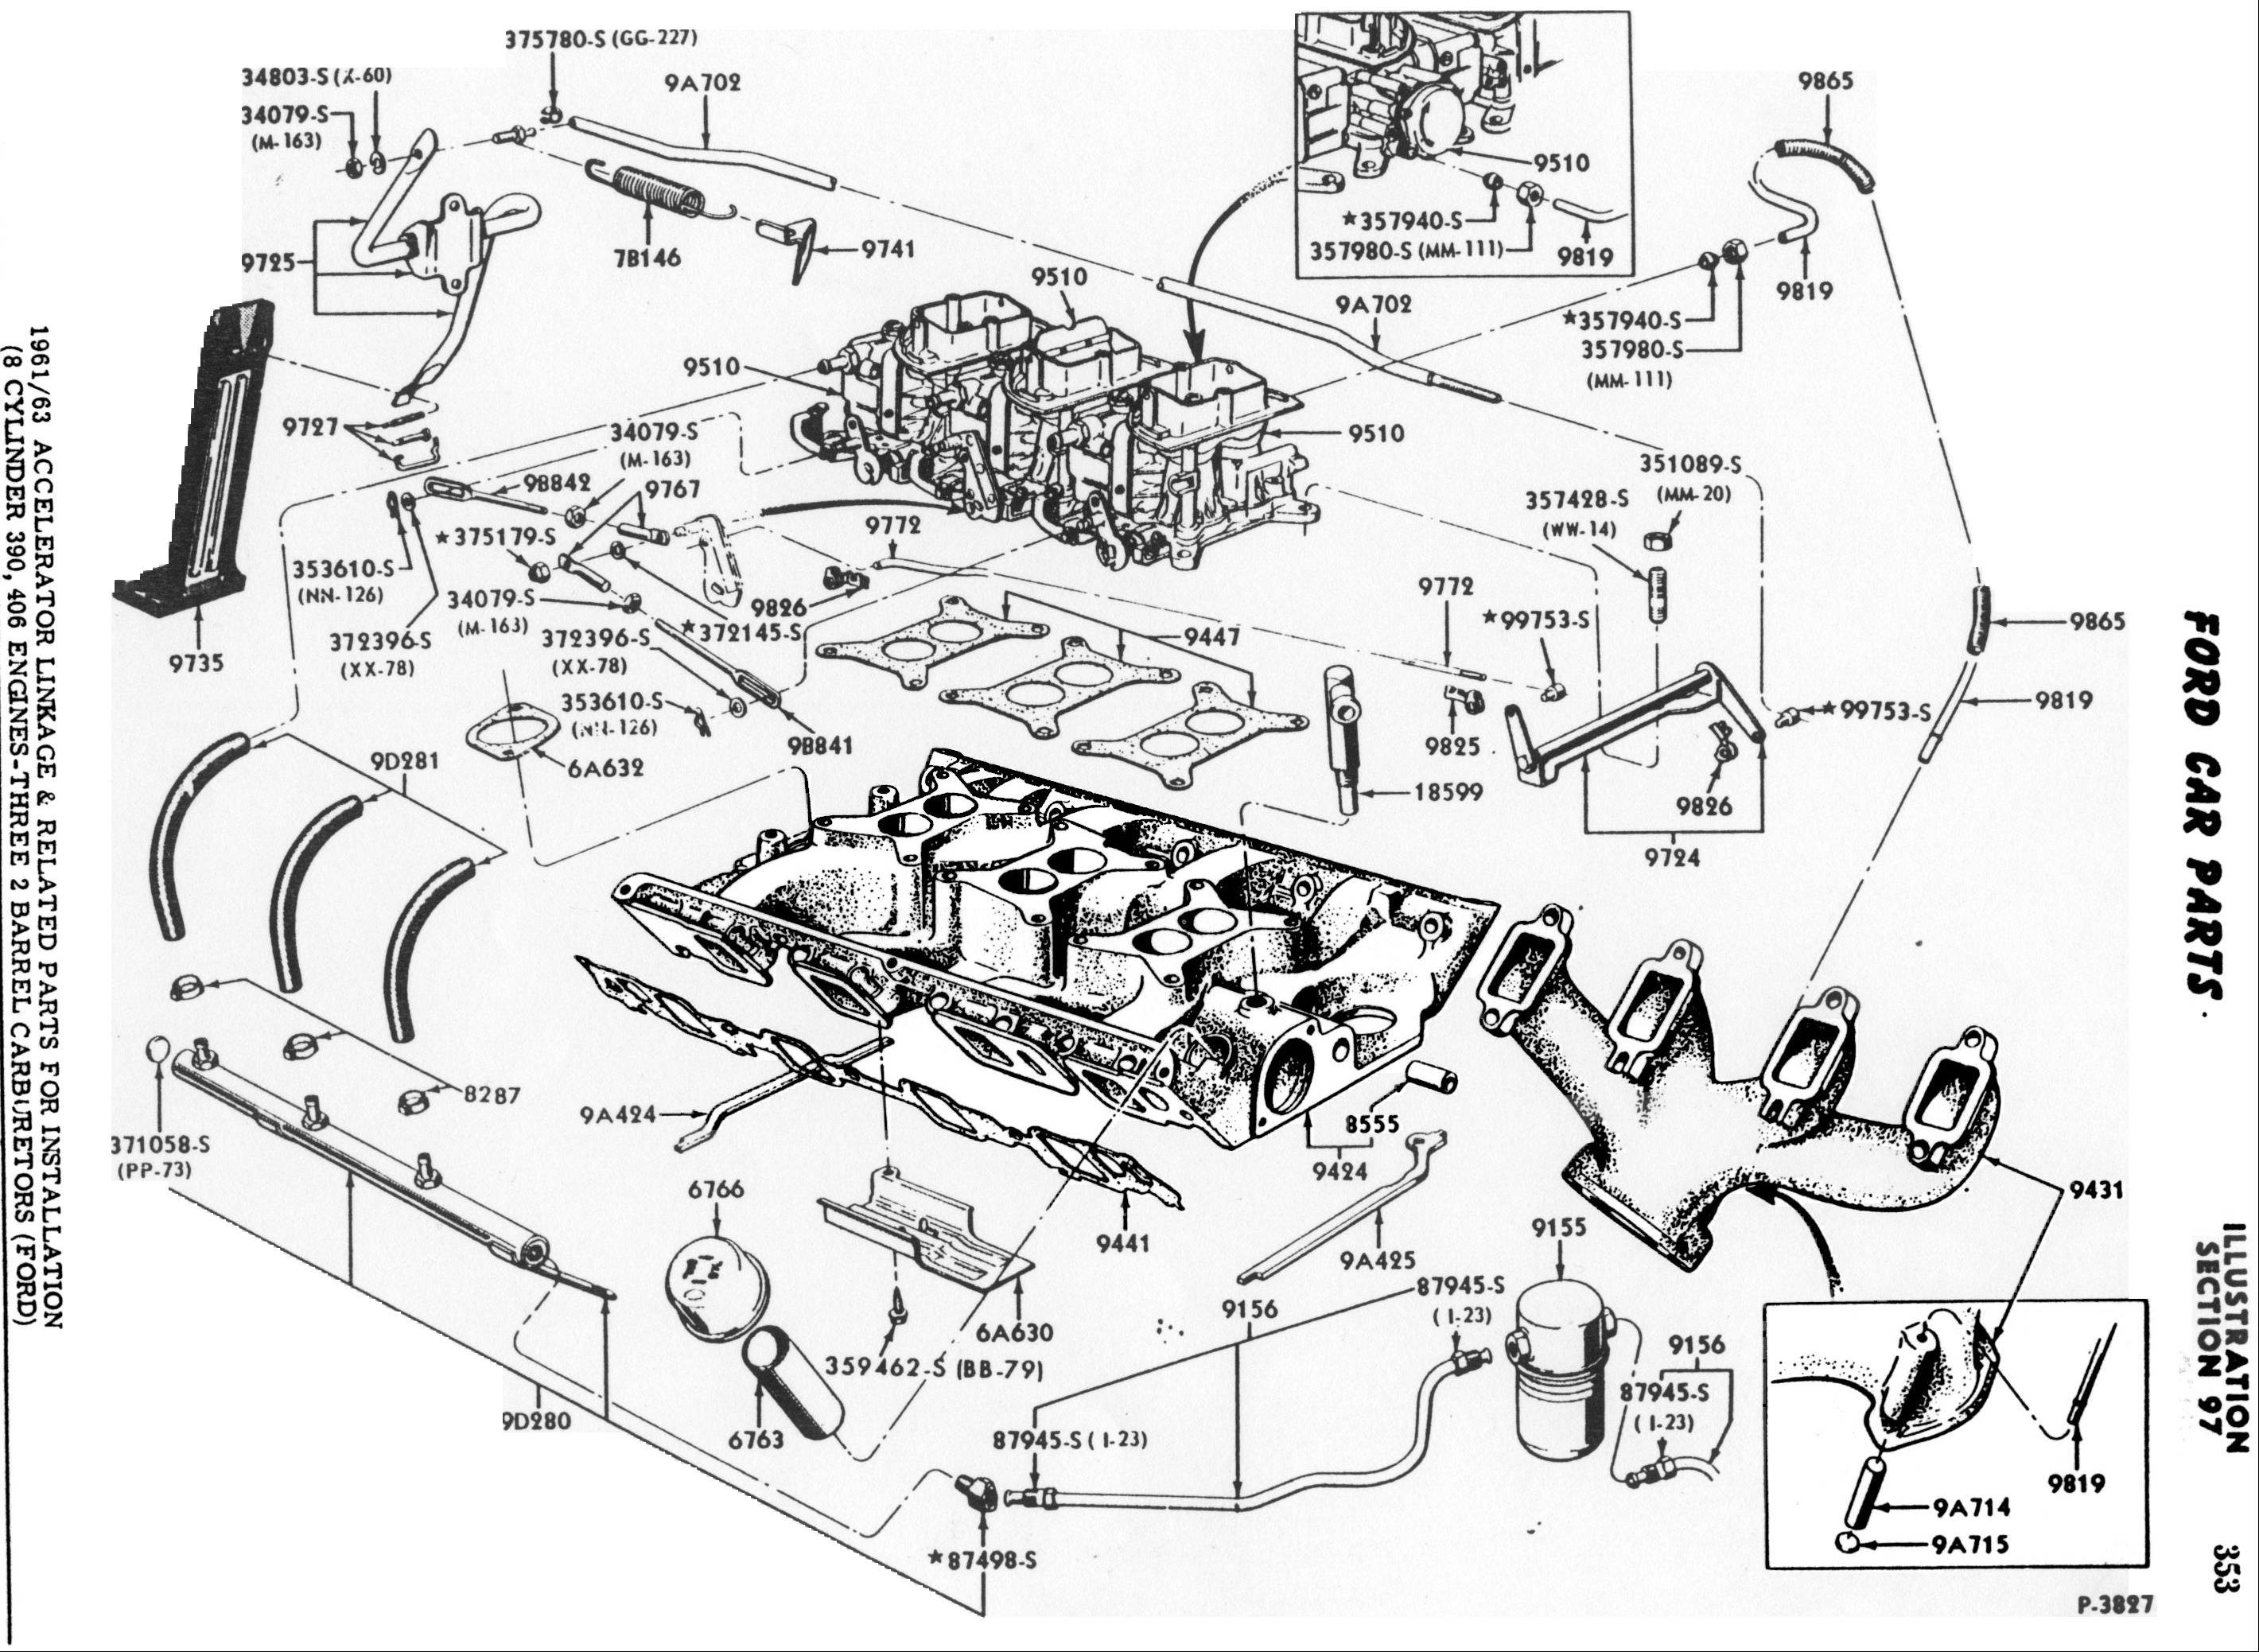 Transit Engine Diagram 460 ford Engine Diagram Wiring Info • Of Transit  Engine Diagram Wiring Schematic